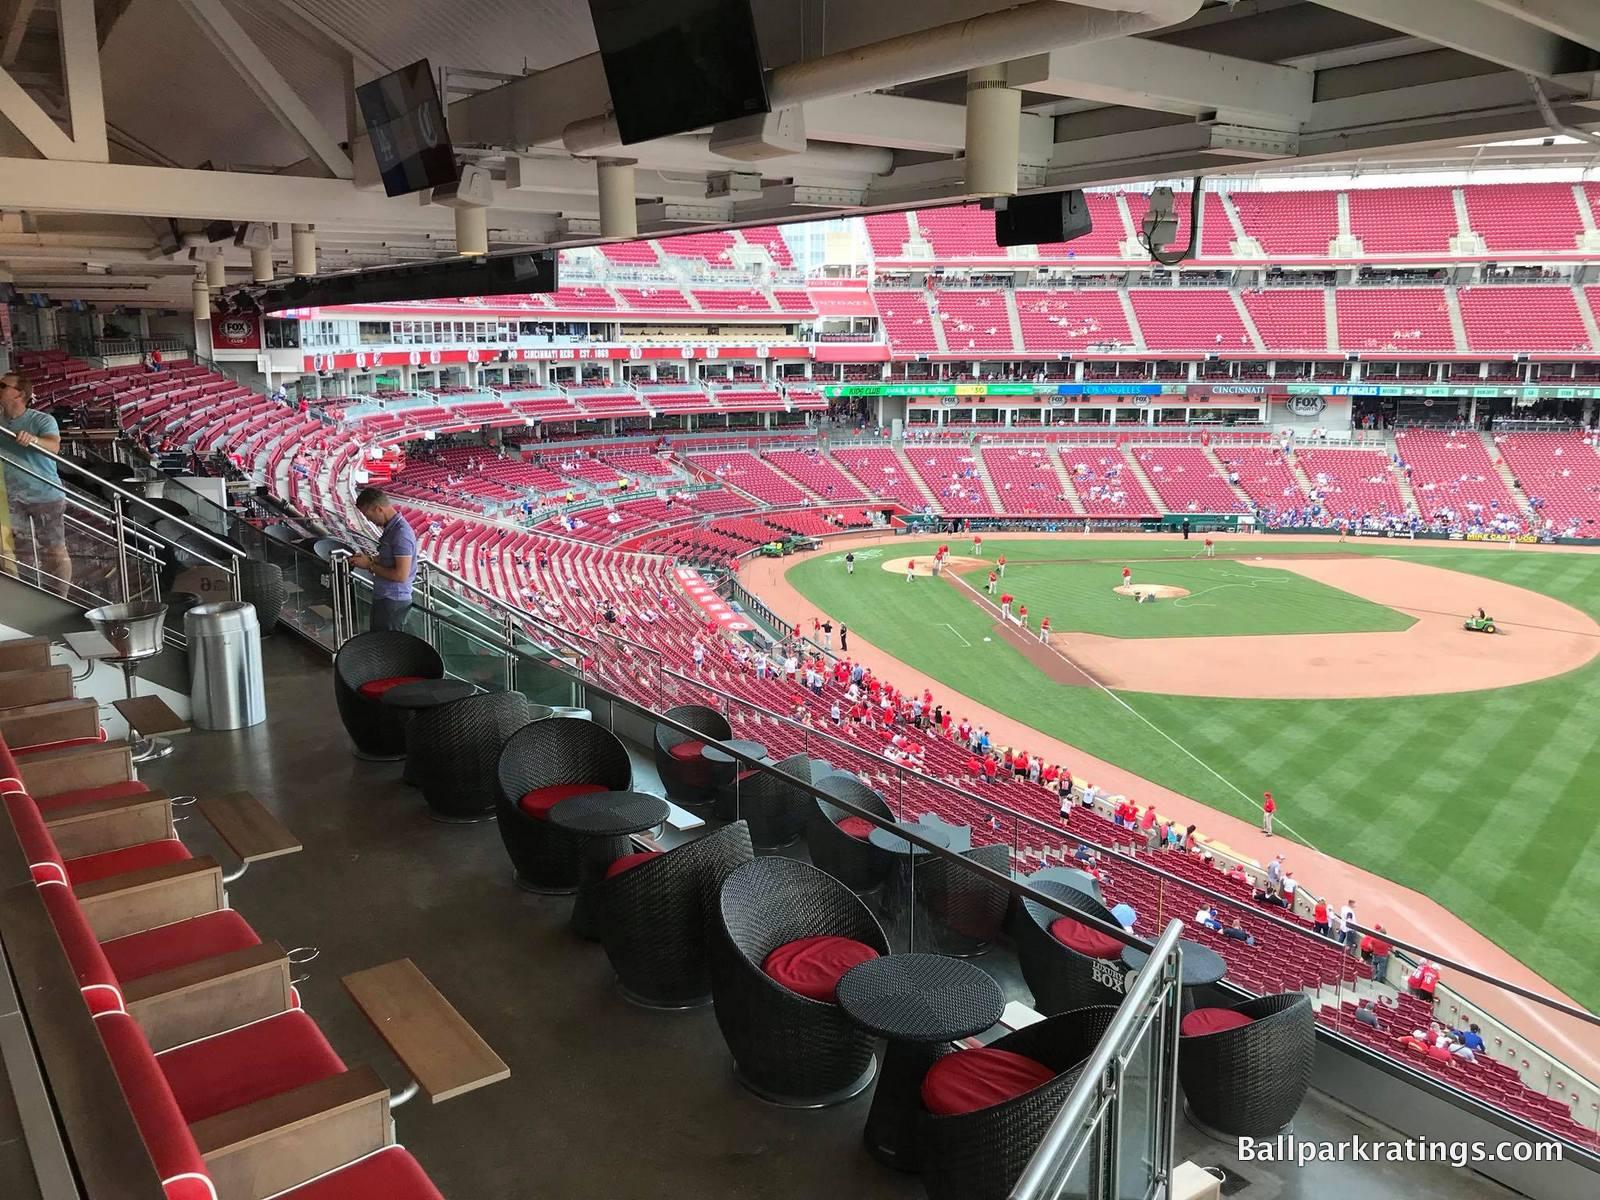 The Handlebar Great American Ballpark